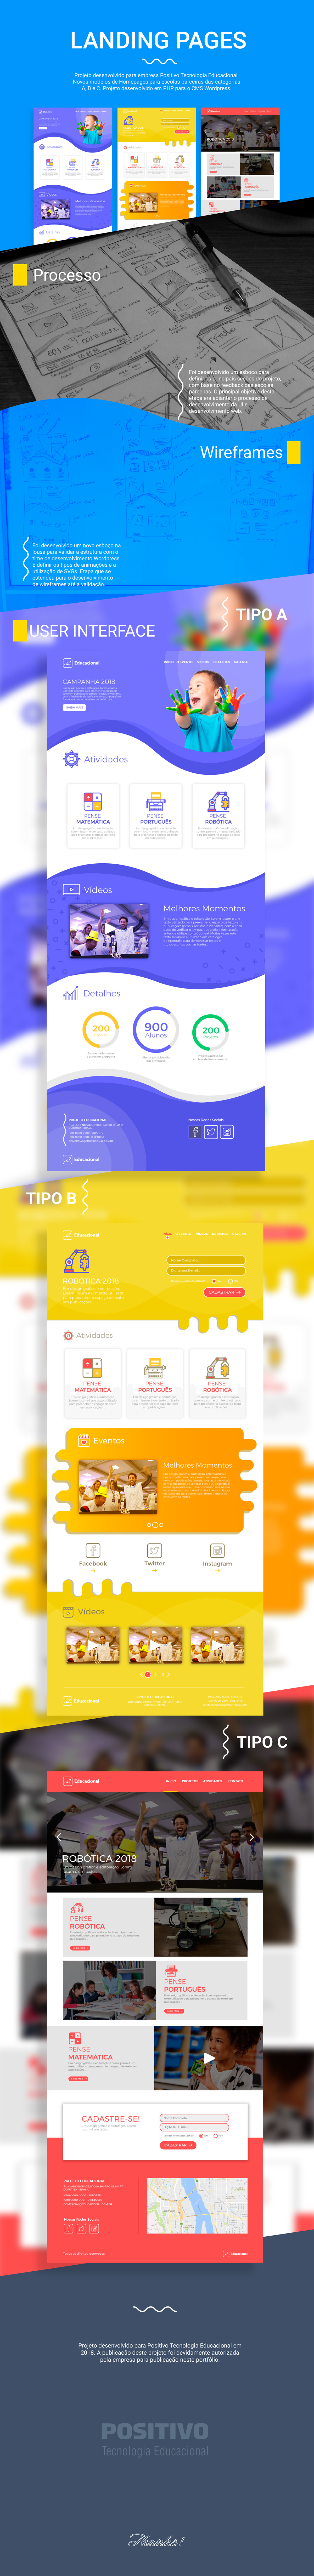 landing page ux UI ai photoshop Illustrator adobe educacional Positivo design de interface